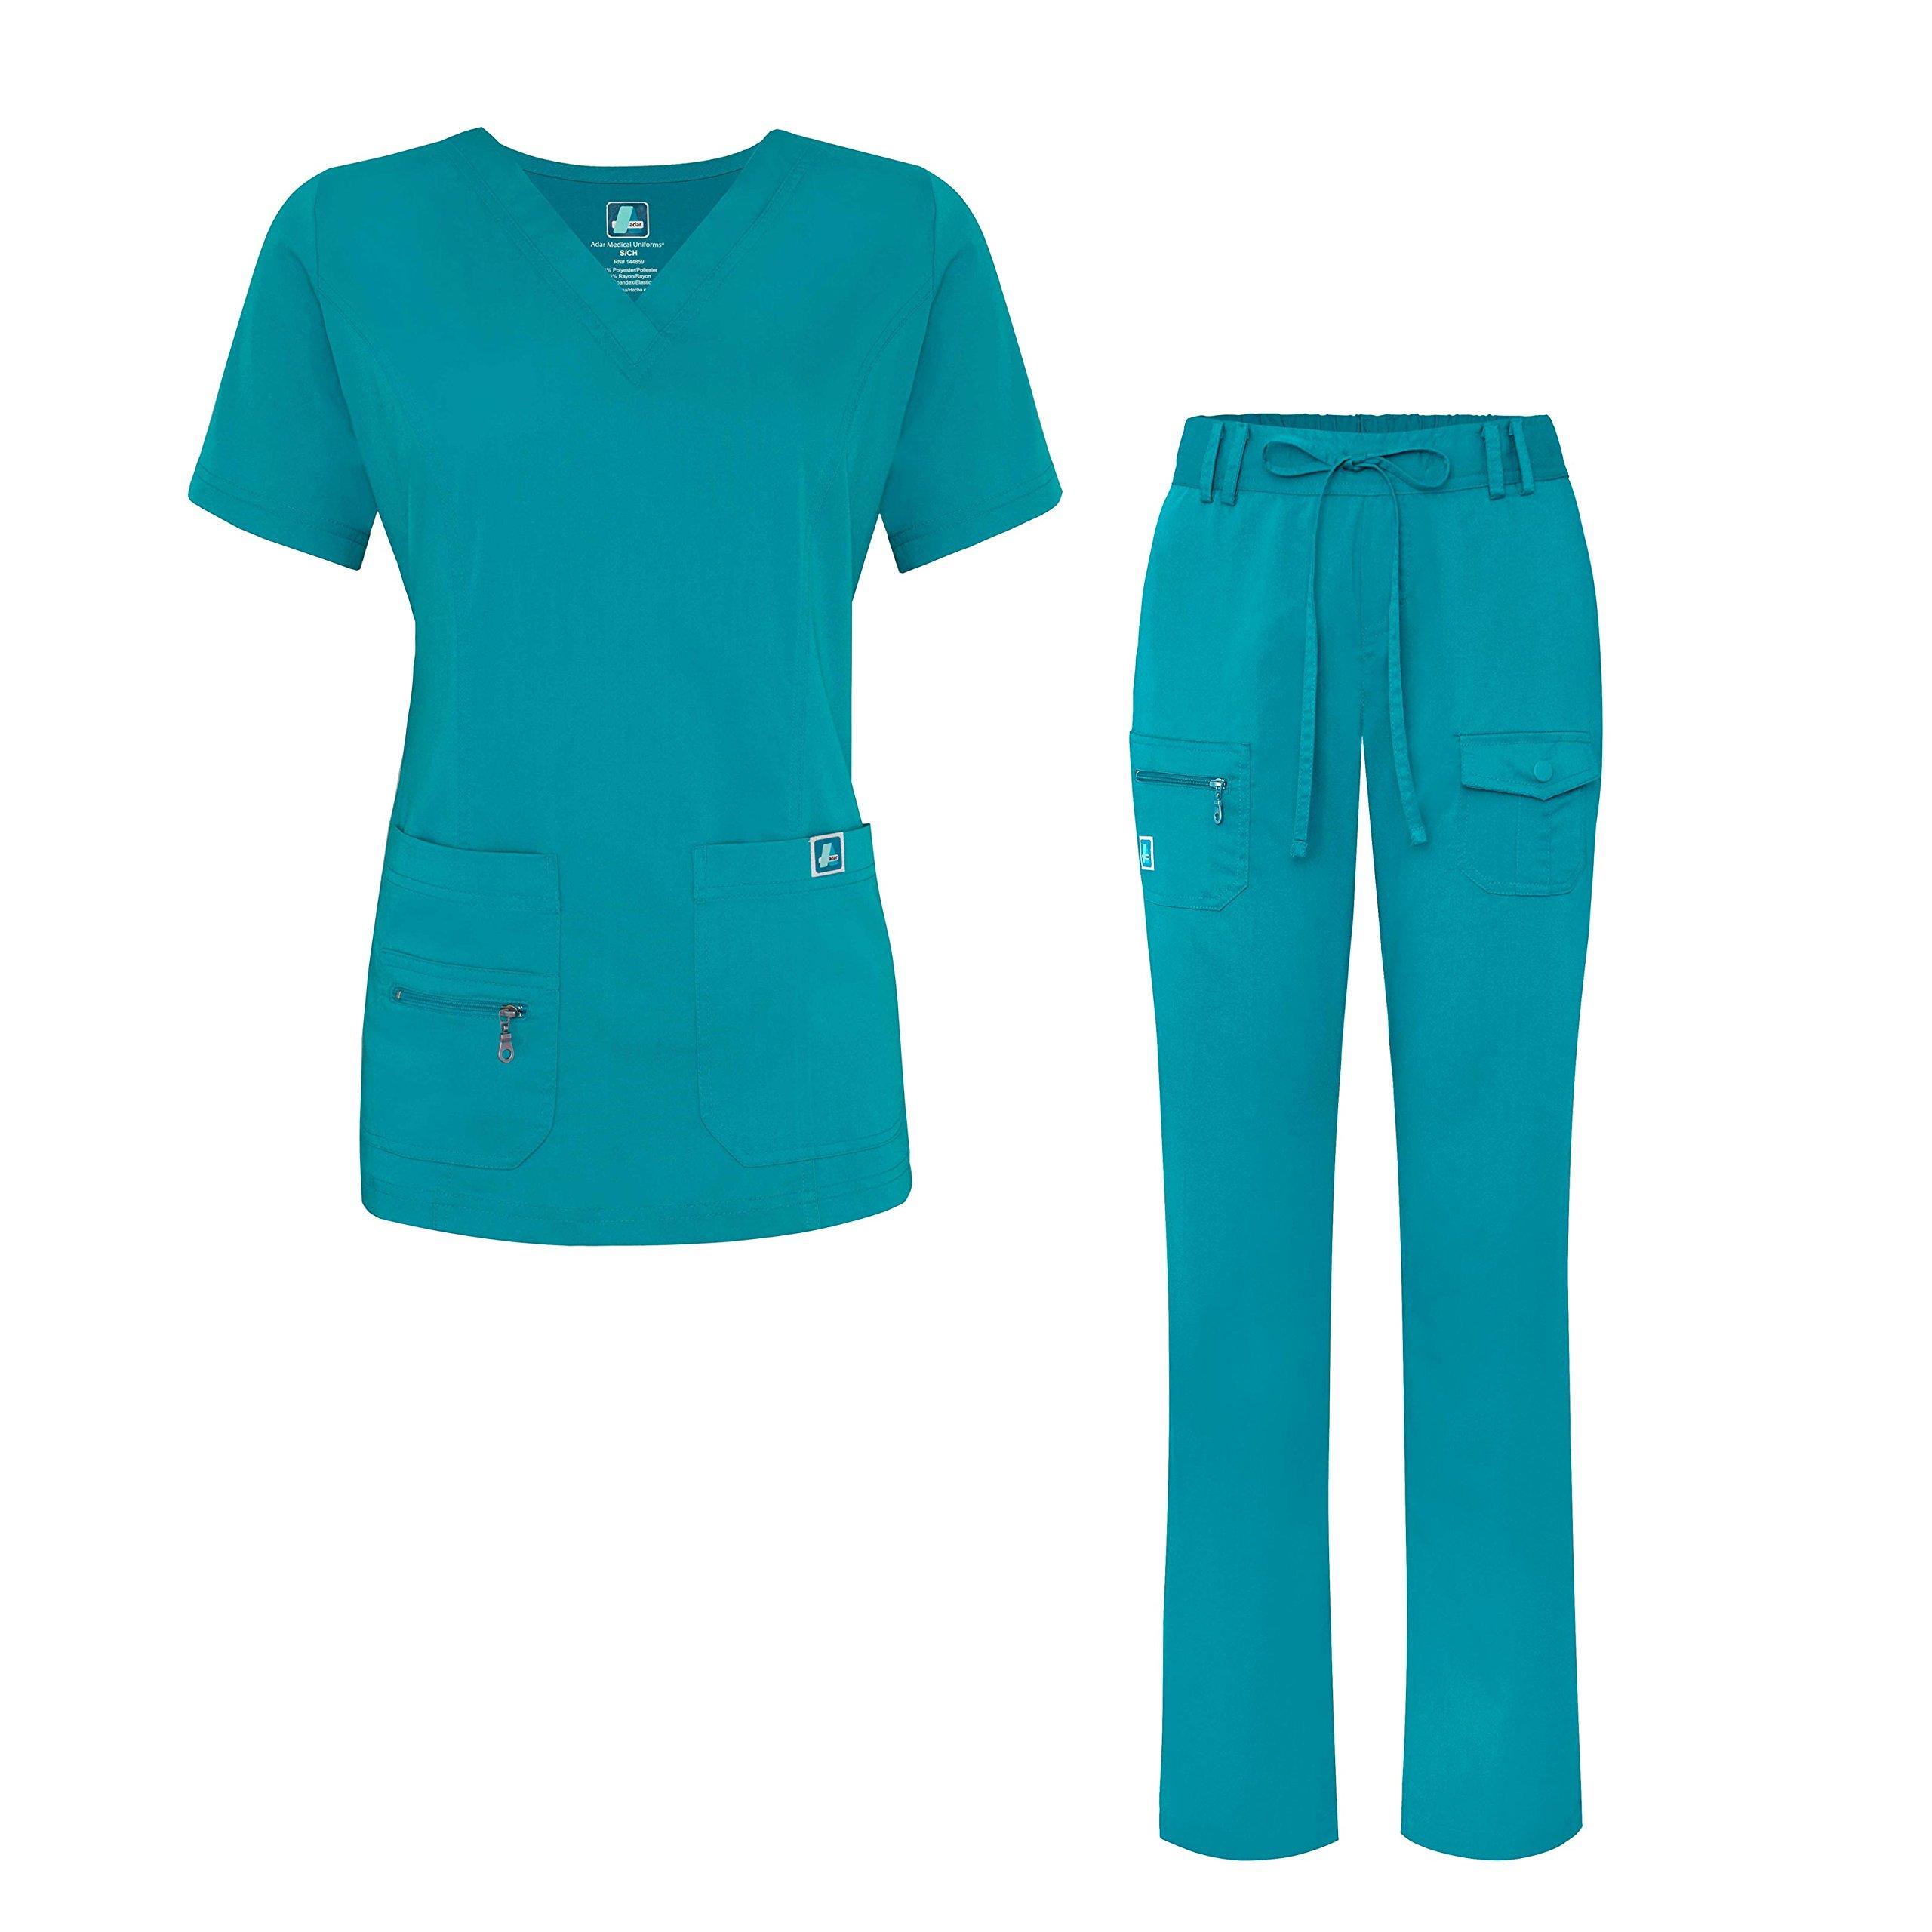 Adar Indulgence Jr. Fit Women's Scrub Set - Enhanced V-Neck Top/Multi Pocket Pants - 4400 - Teal Green - XXS